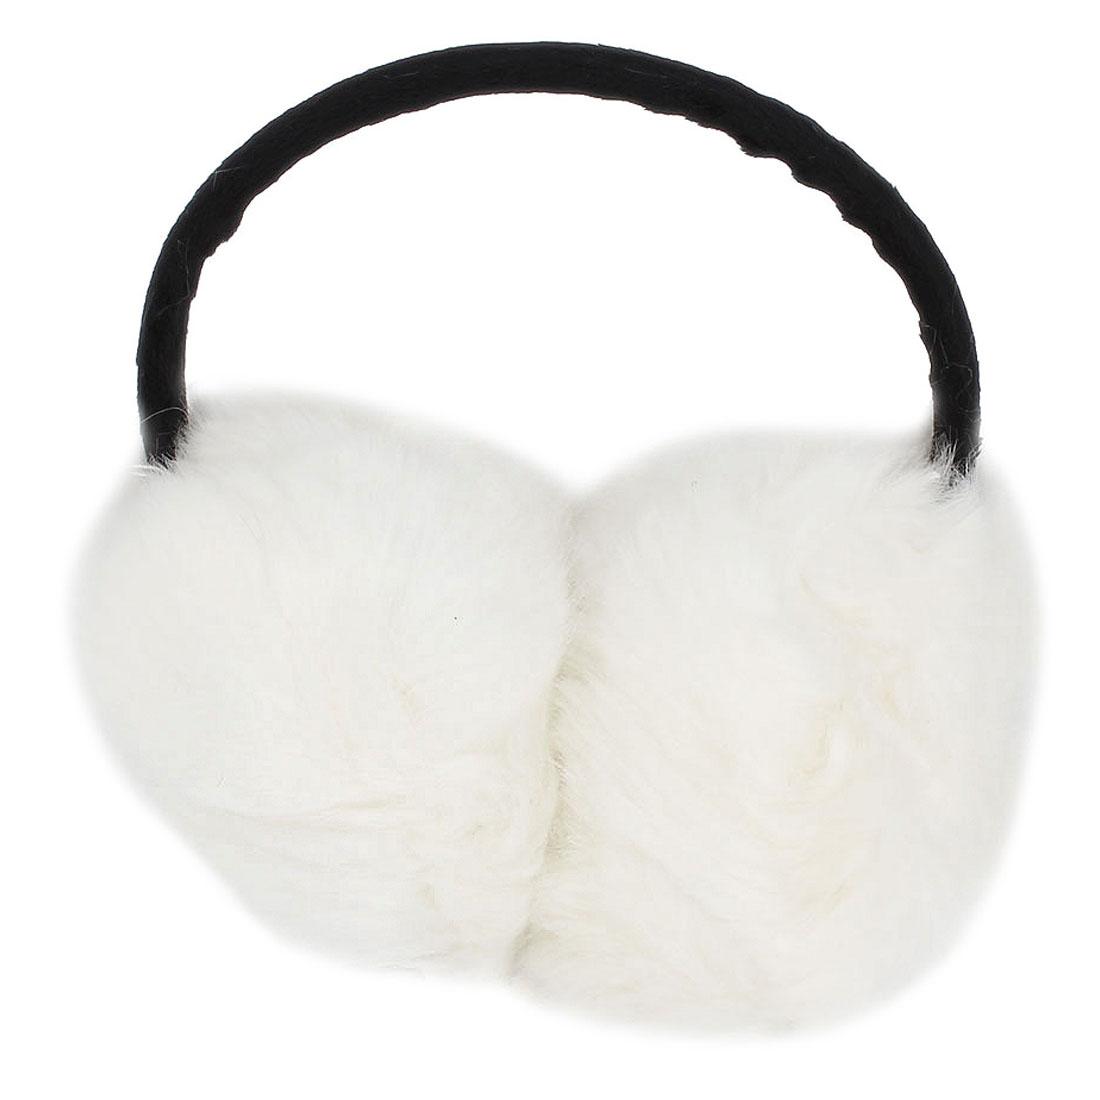 Plastic Frame White Soft Plush Fluffy Ear Warmers Earmuffs for Lady